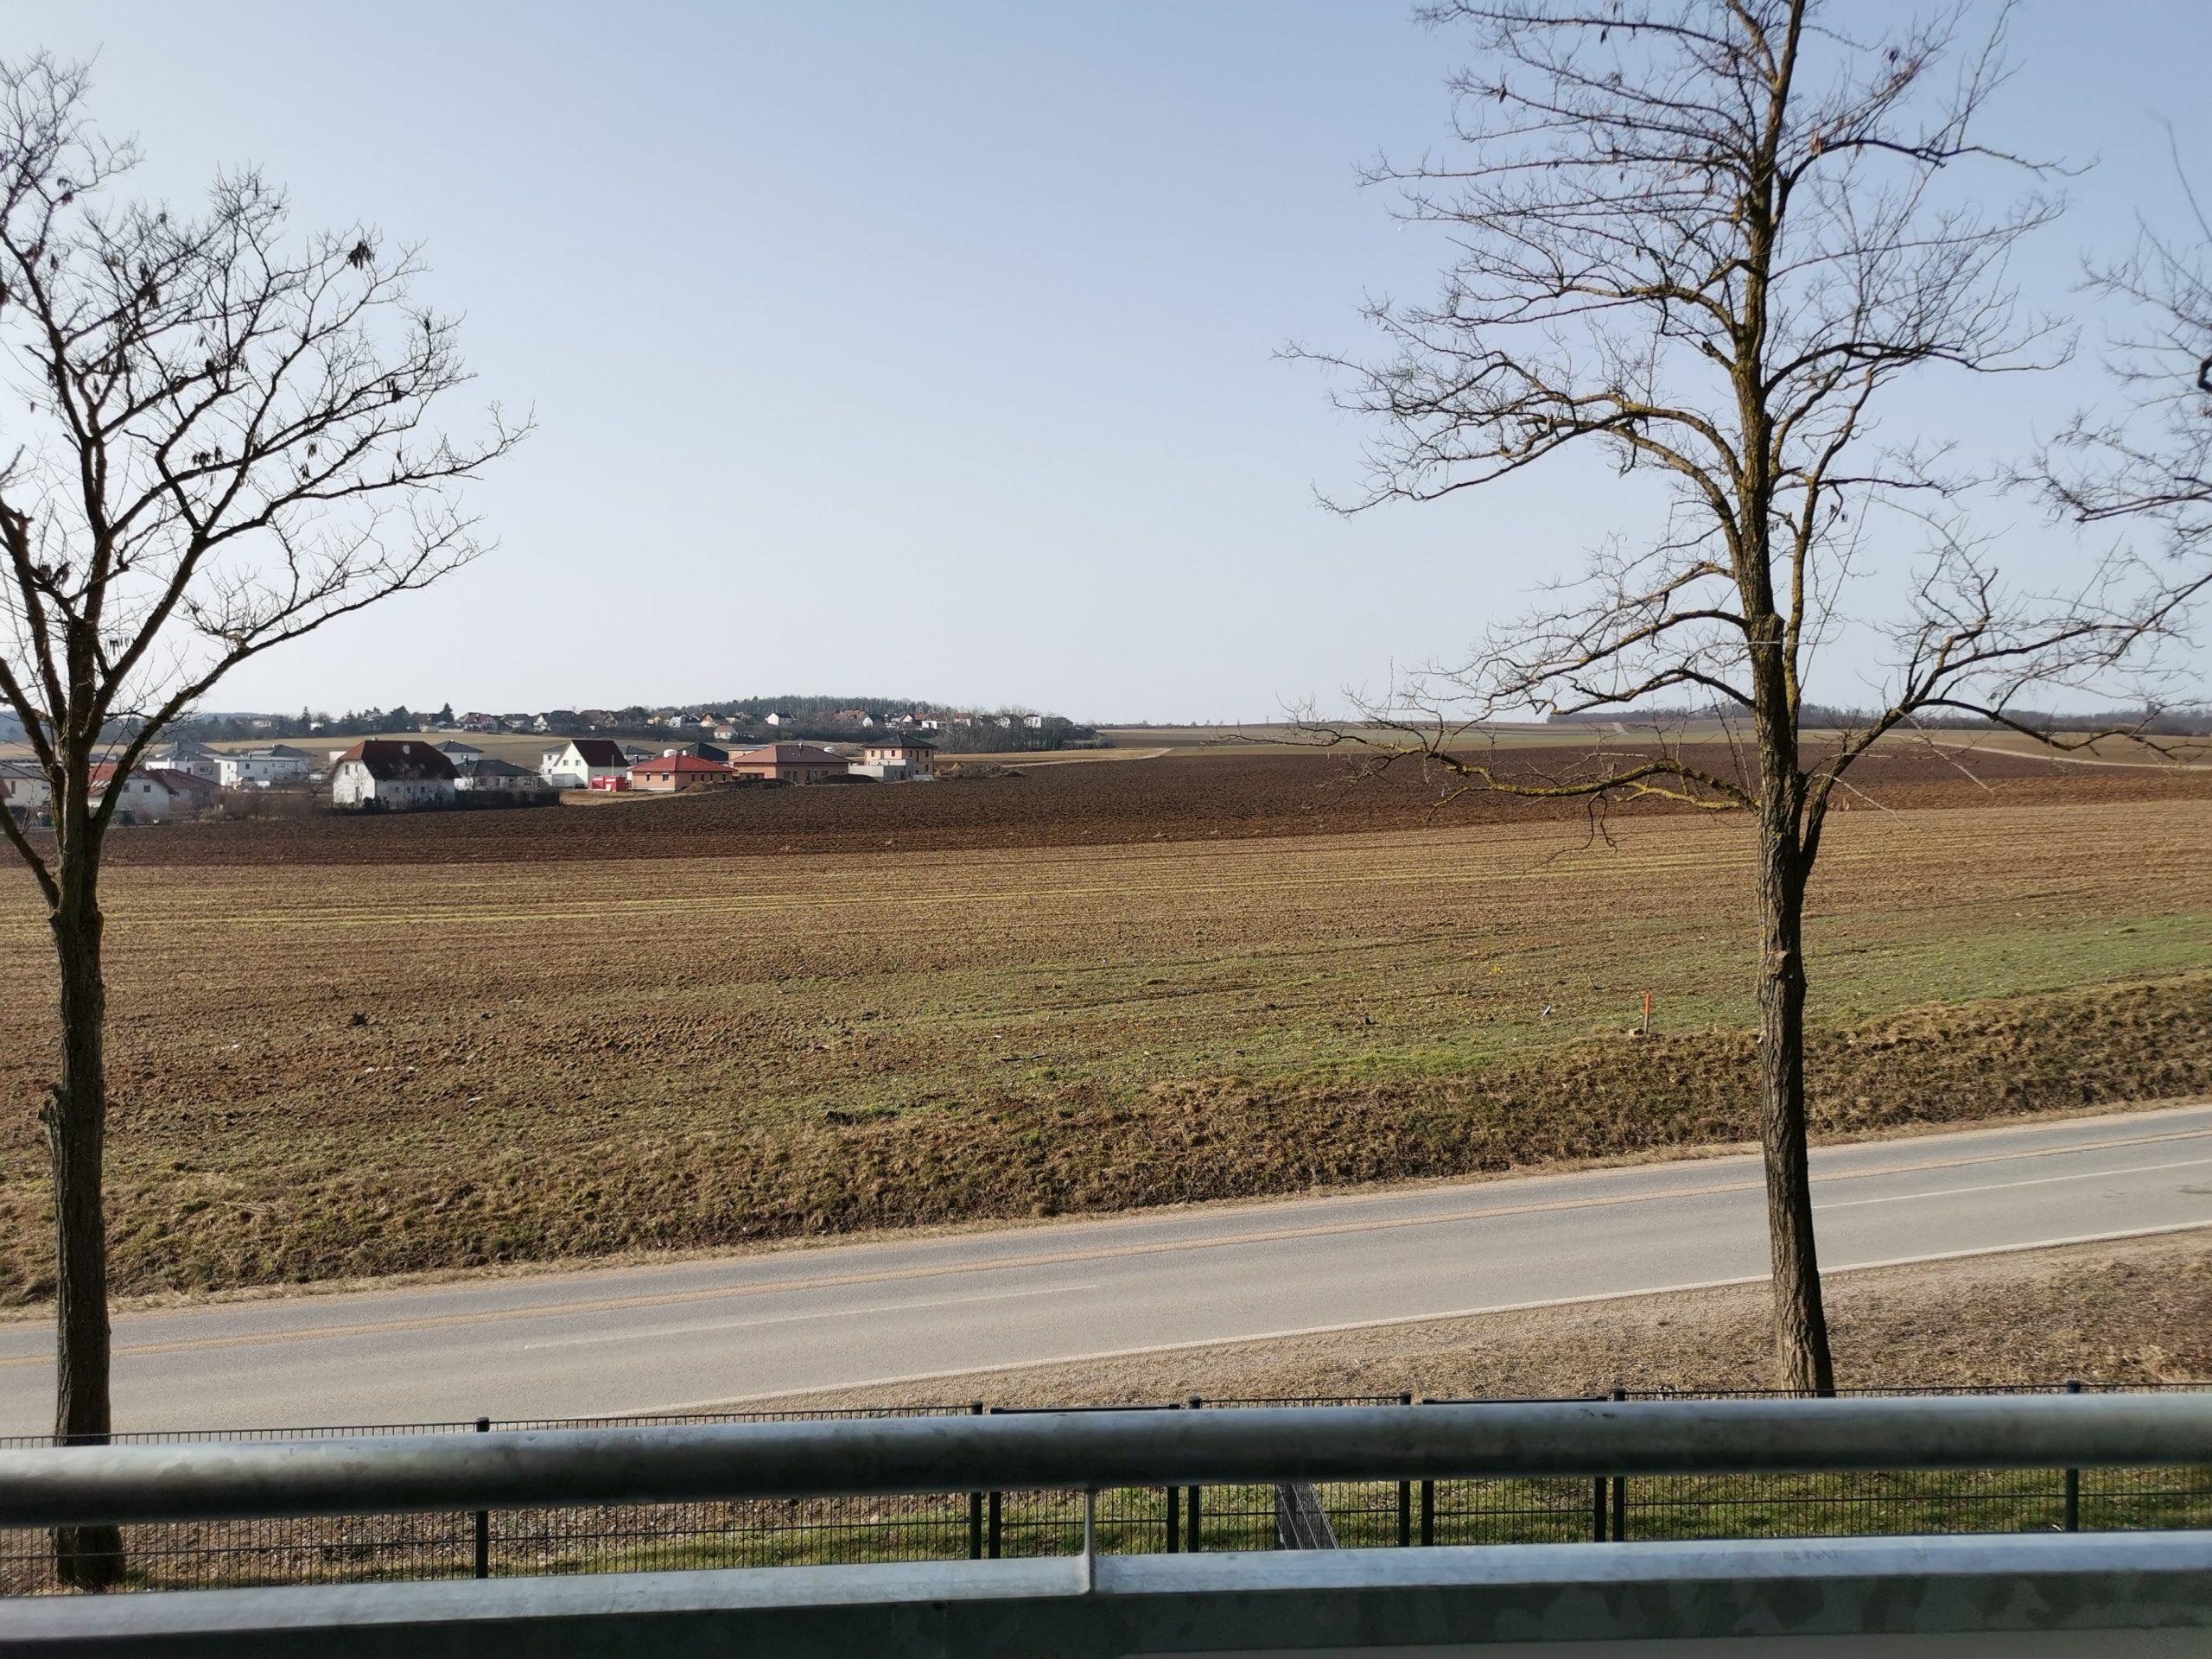 Immobilie von Kamptal in 3730 Eggenburg, Horn, Eggenburg VII - Top 207 #1